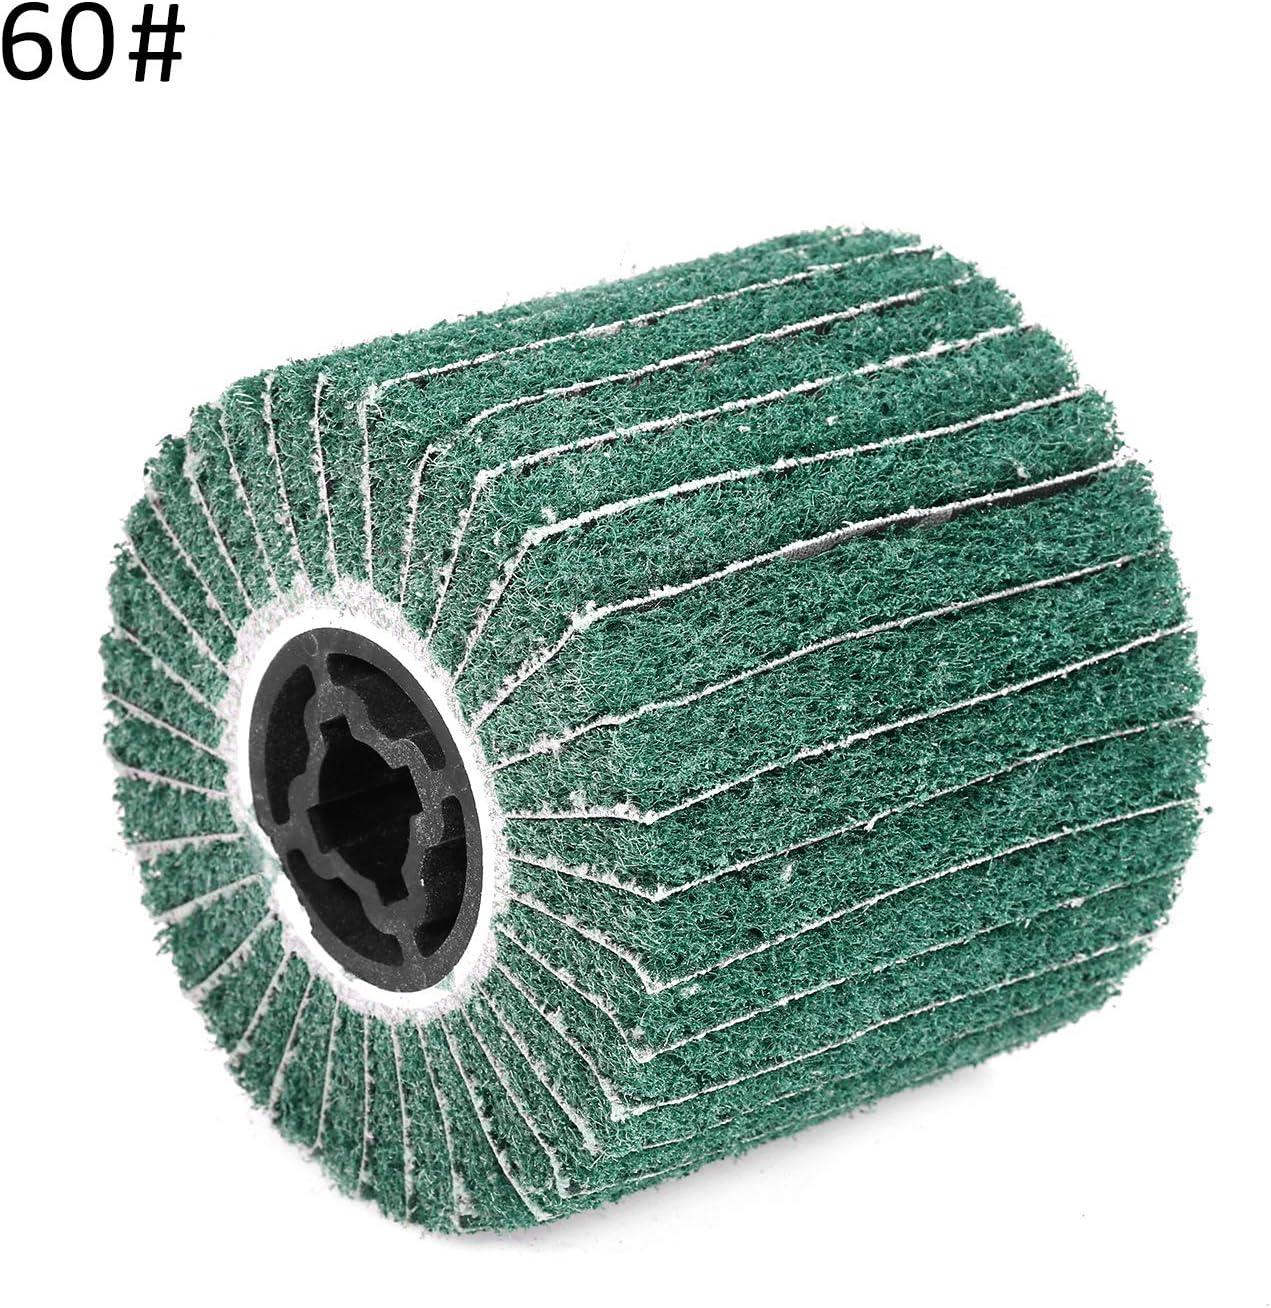 Zitainn Flap Wheel,Non-Woven Burnishing Wheel Stainless Steel Wire Drawing Wheel Fiber Wheel of Portable Motor Burnishing Polishing Wheel Compatible with Burnishing Machine//Polisher//Sander Green 60#